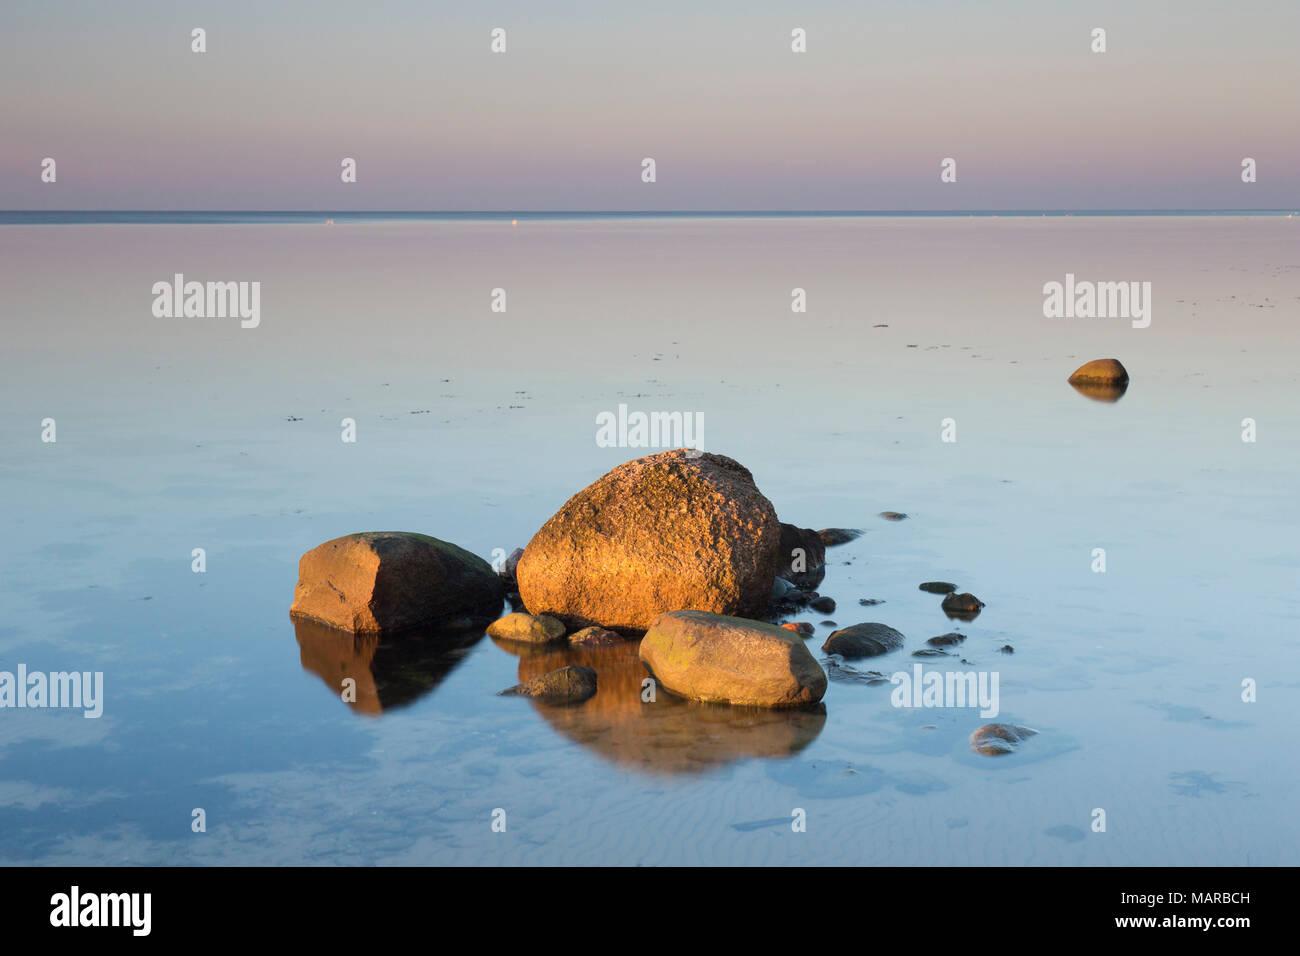 Rocks in the Baltic Sea. Mecklenburg-West Pomerania, Germany - Stock Image